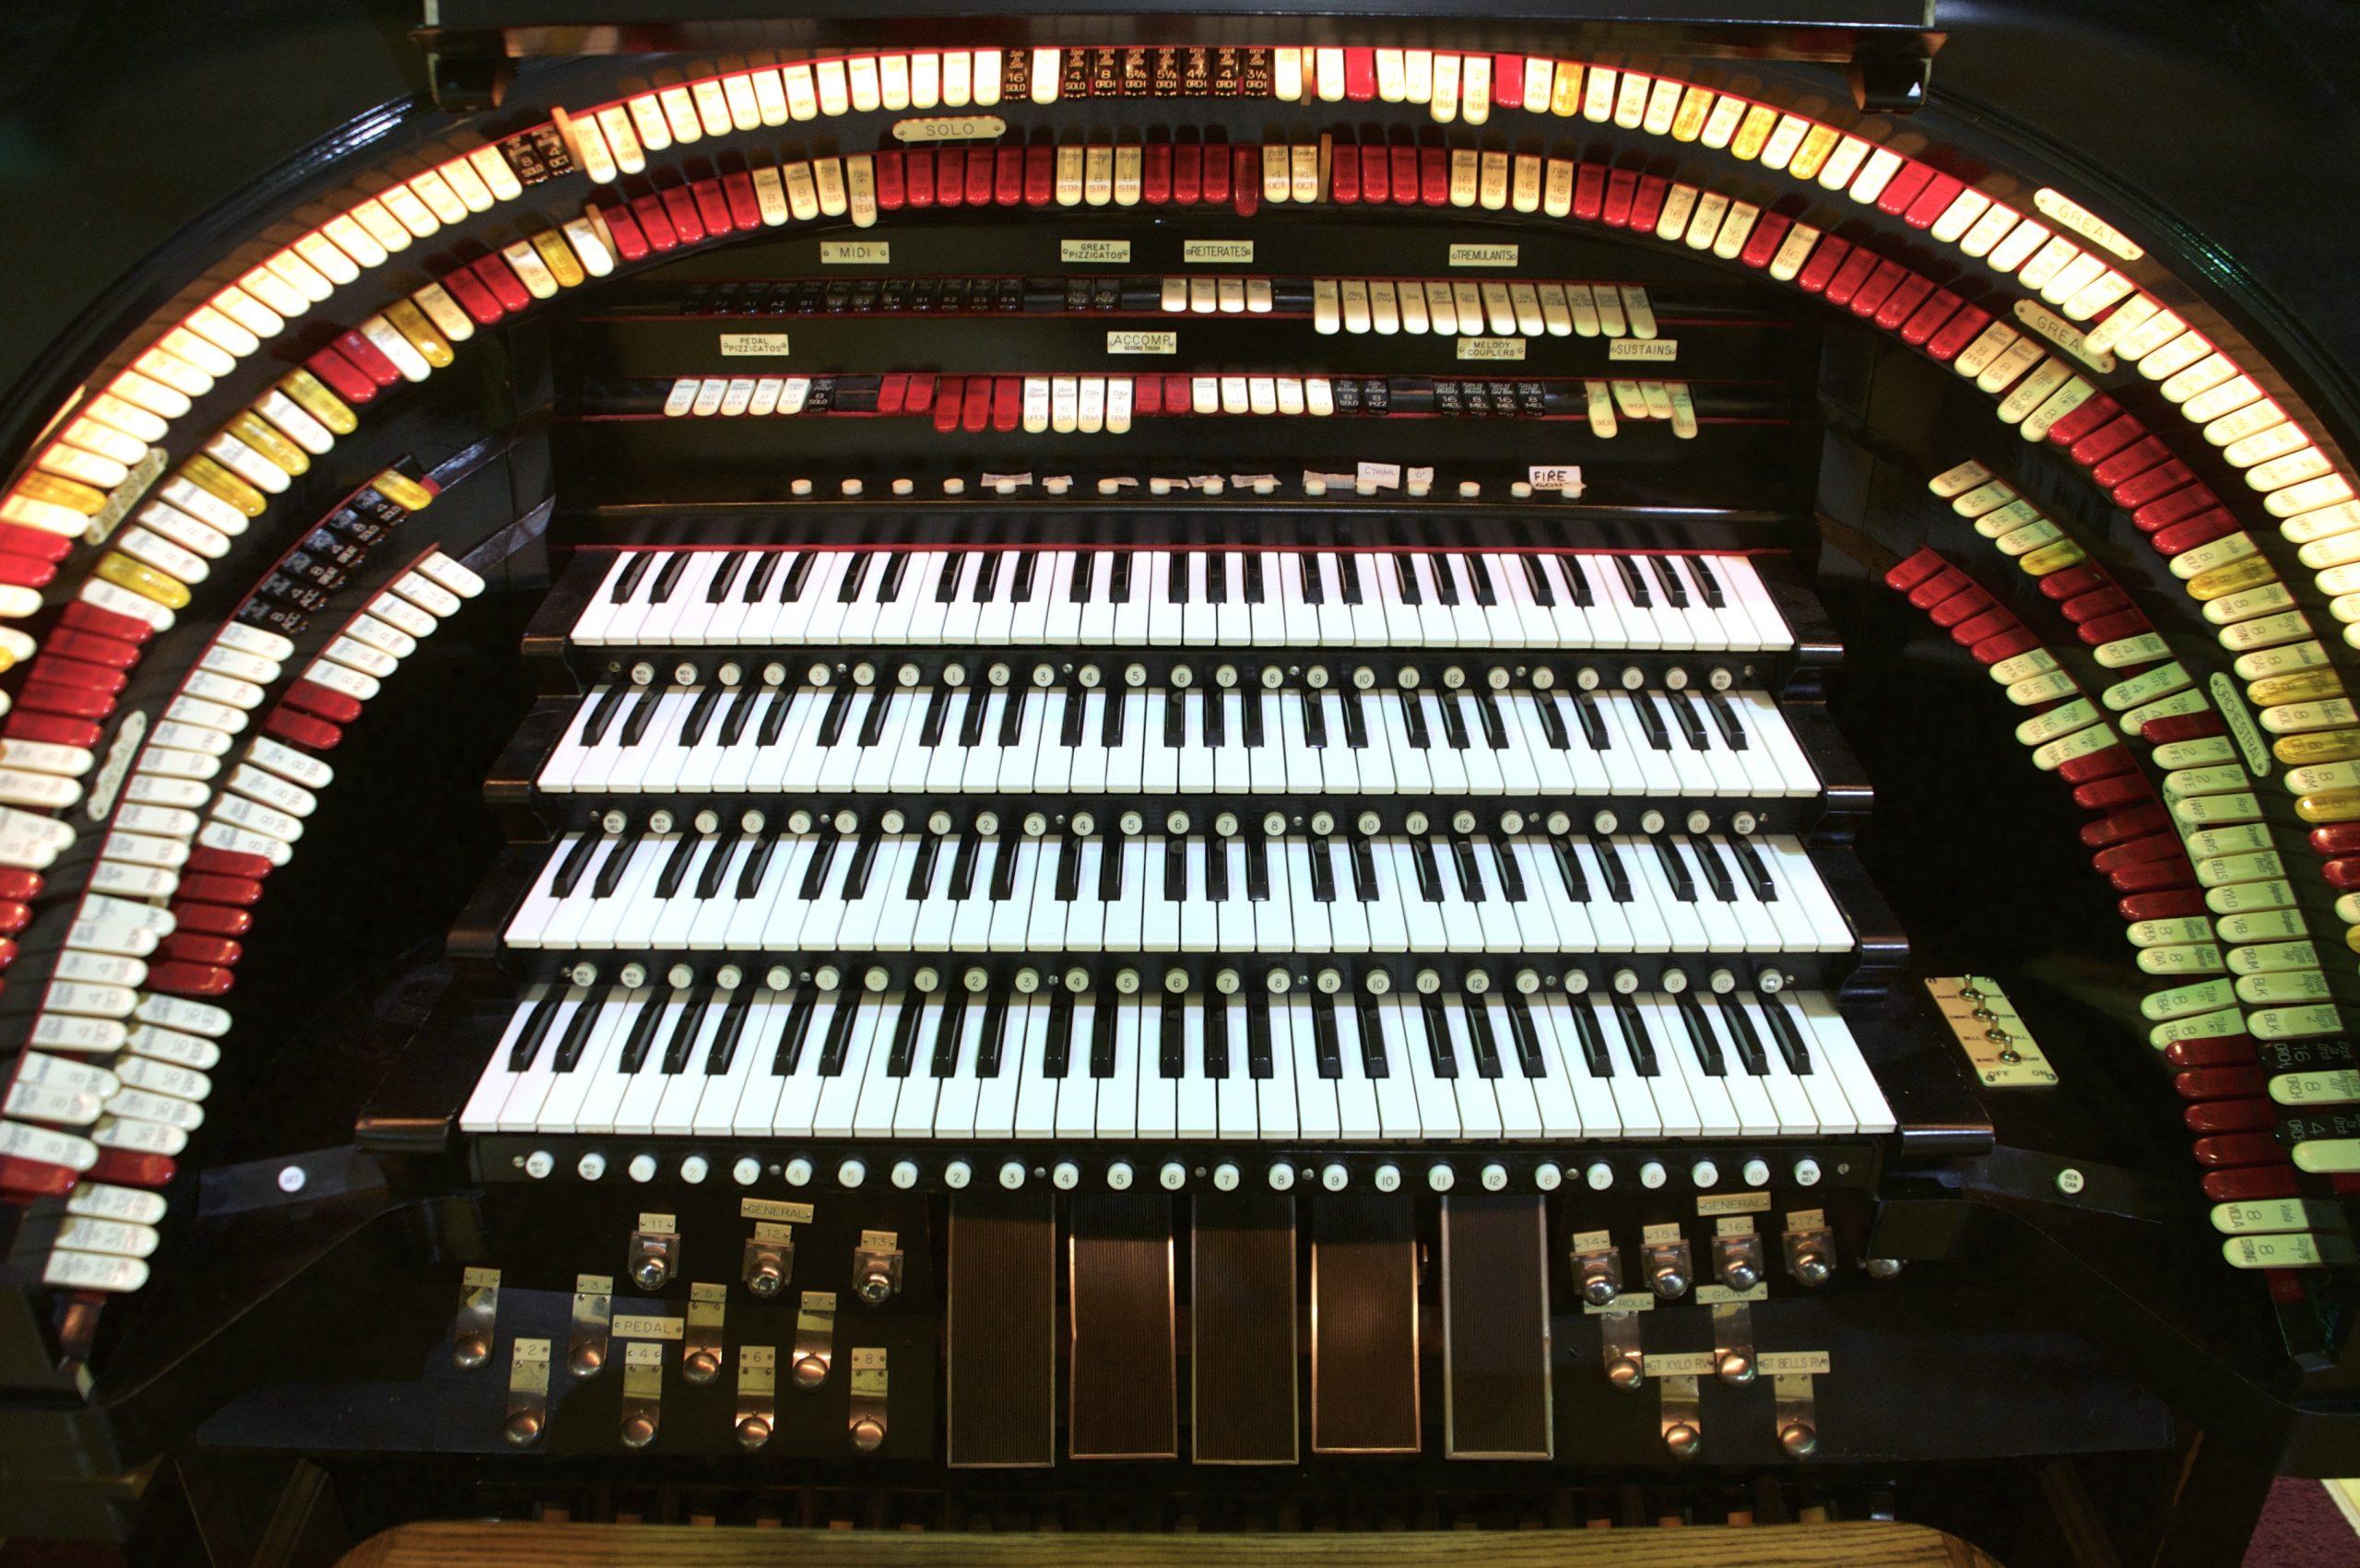 The organ console of the Mighty Kremer Wonder Organ.